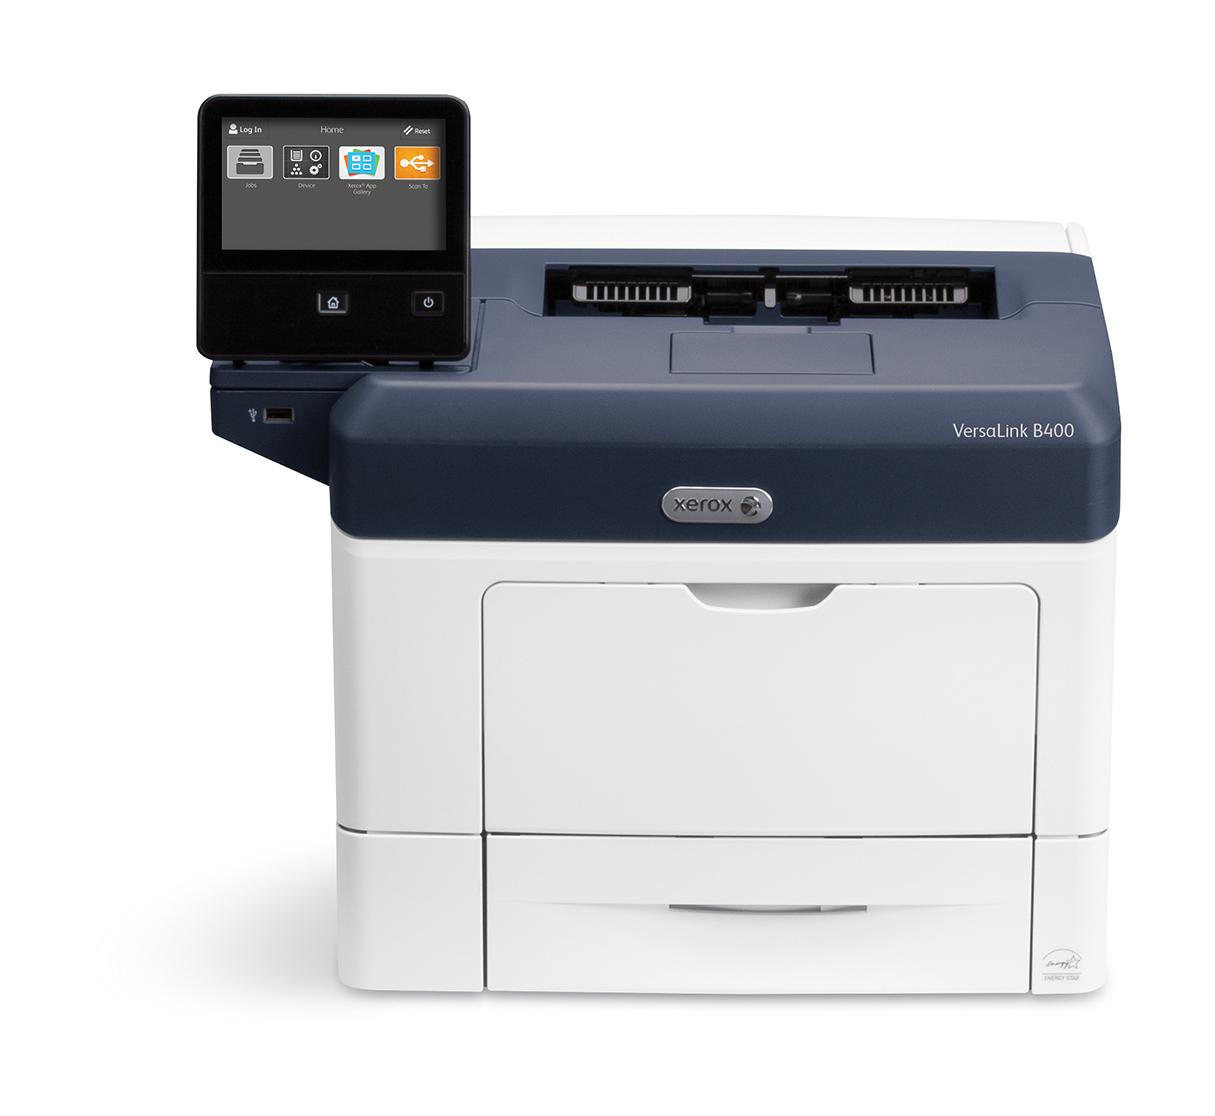 Xerox VersaLink B400 A4 45 ppm impresora dúplex sin contrato PS3 PCL5e/6 2 bandejas Total 700 hojas